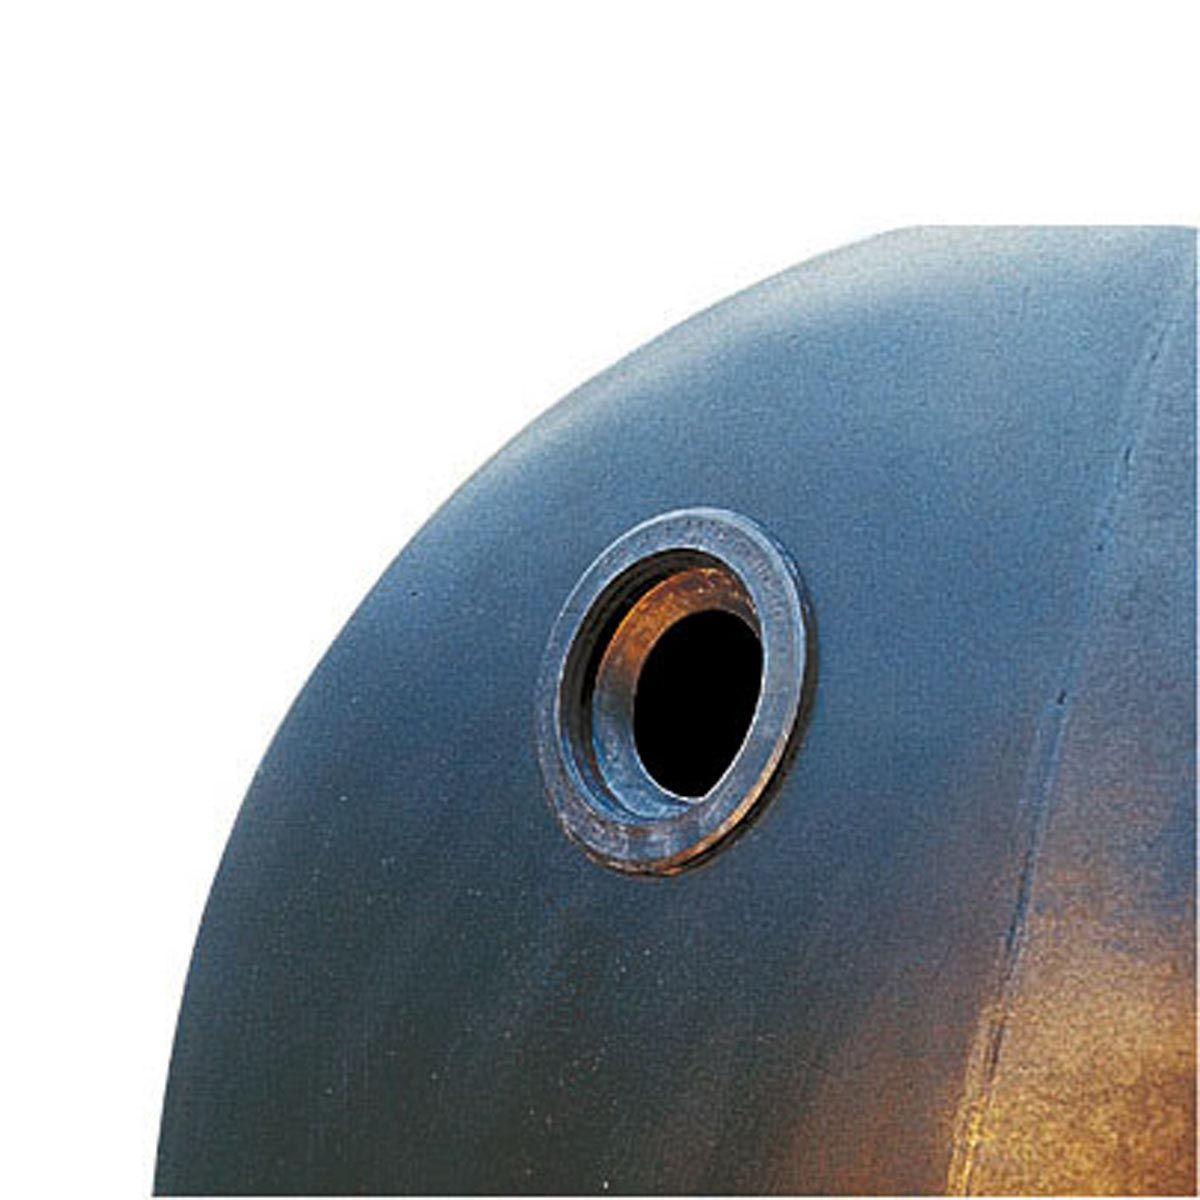 Joint spécial, rouge, D 124 mm, WS 14-17 mm